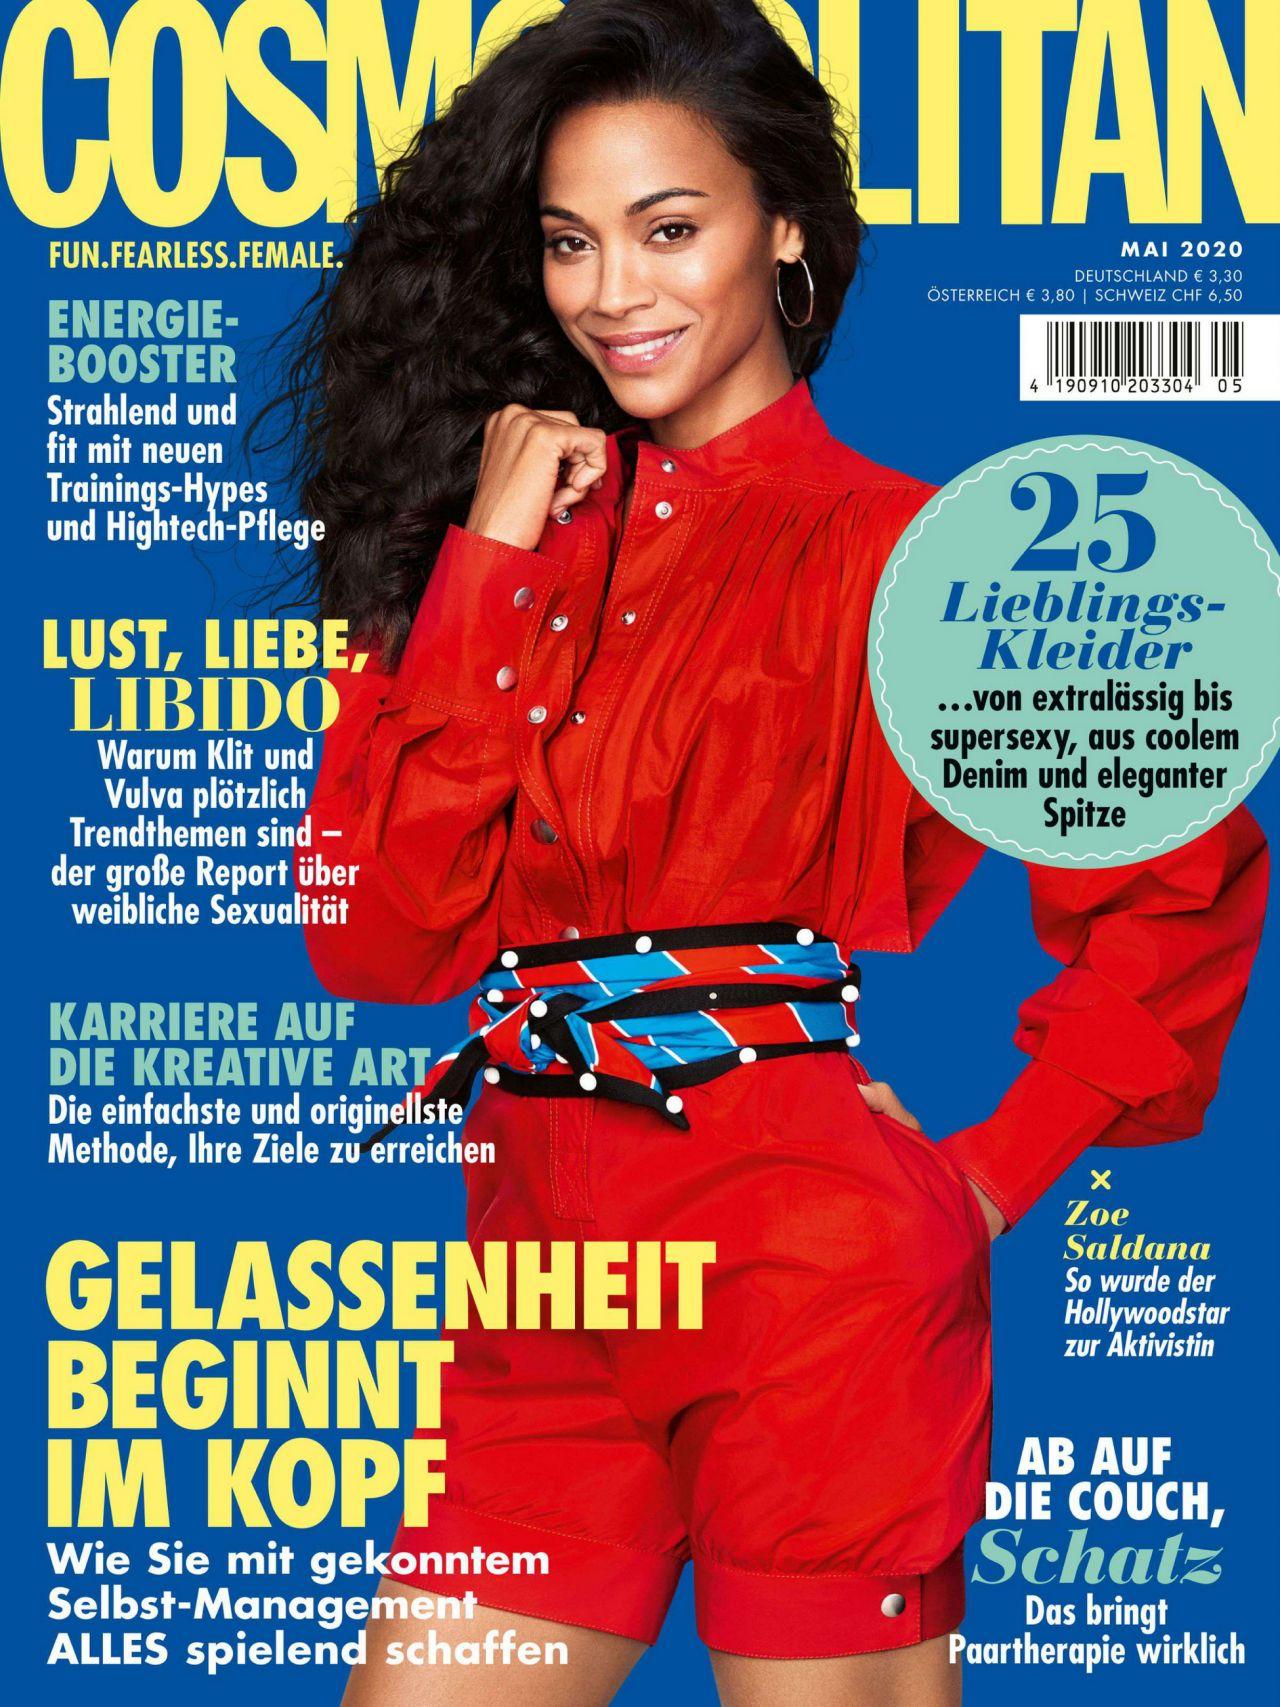 zoe-saldana-covers-cosmopolitan-magazine-germany-may-2020-issue